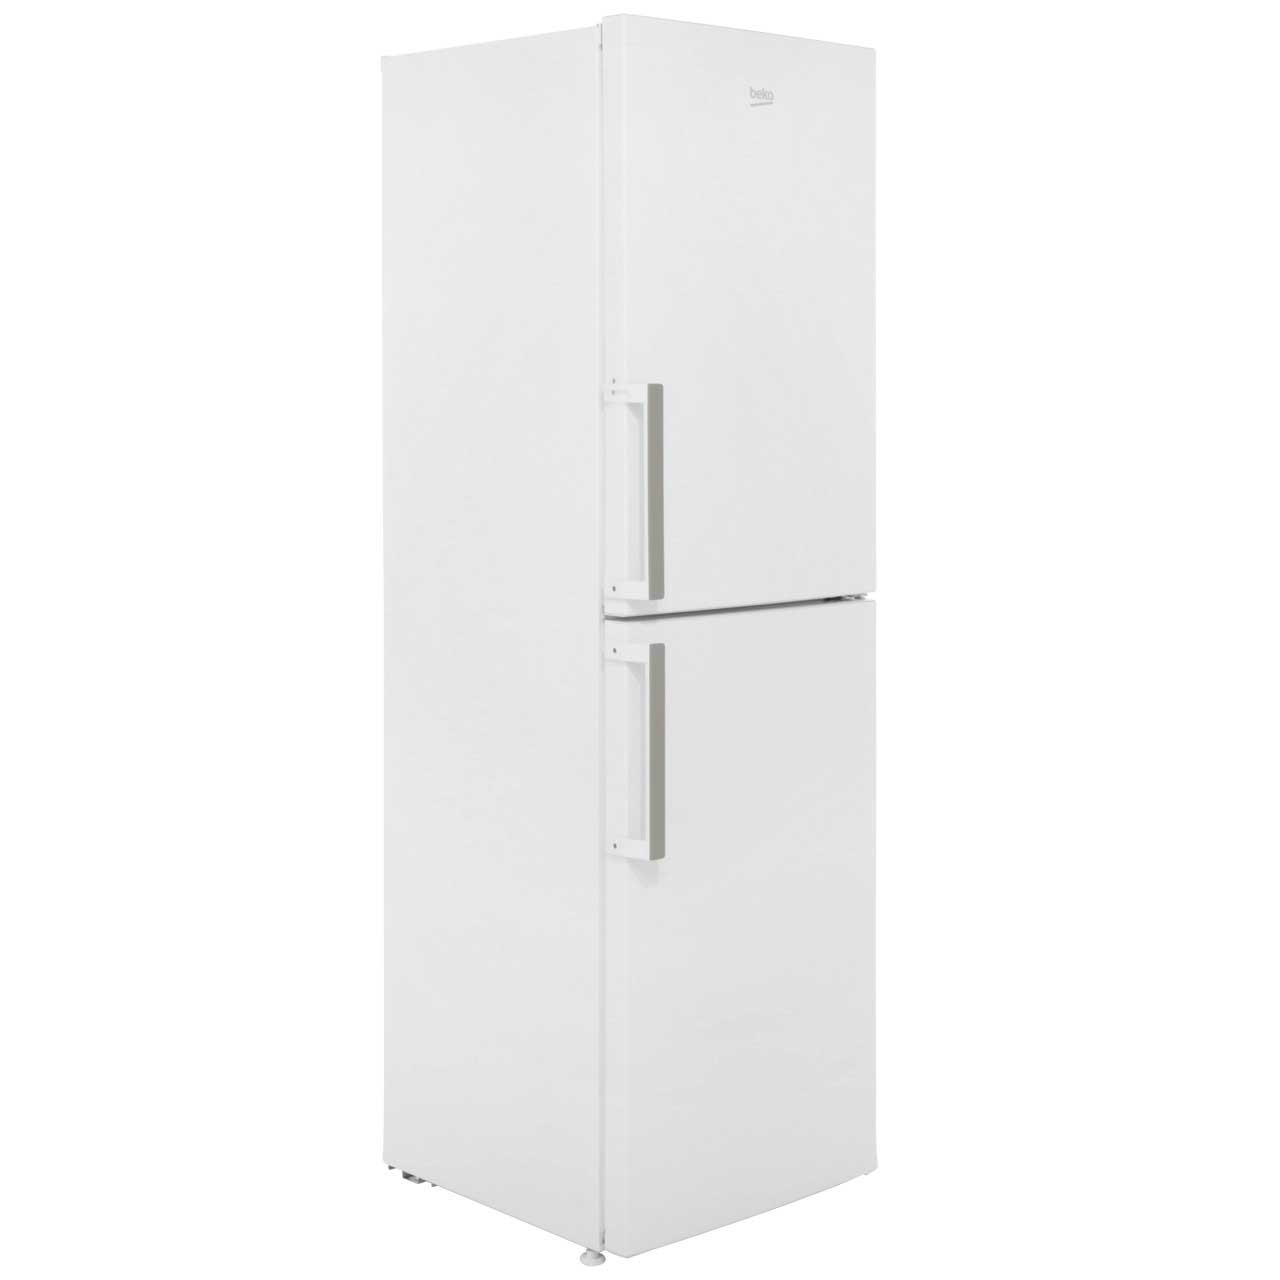 Beko slimline fridge freezer